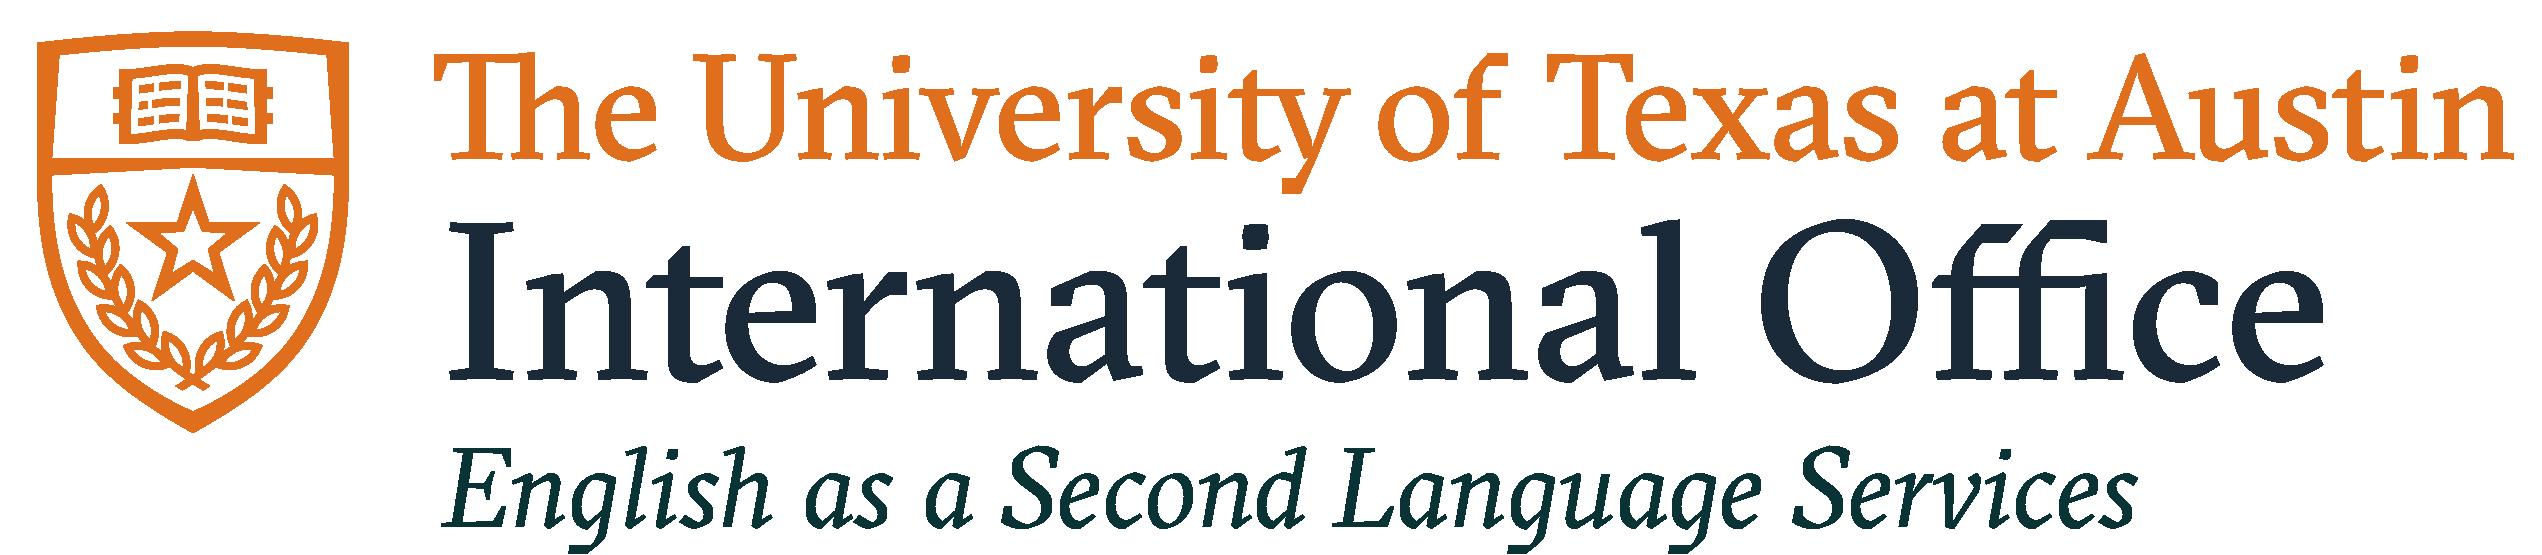 ESL Services, The University of Texas at Austin